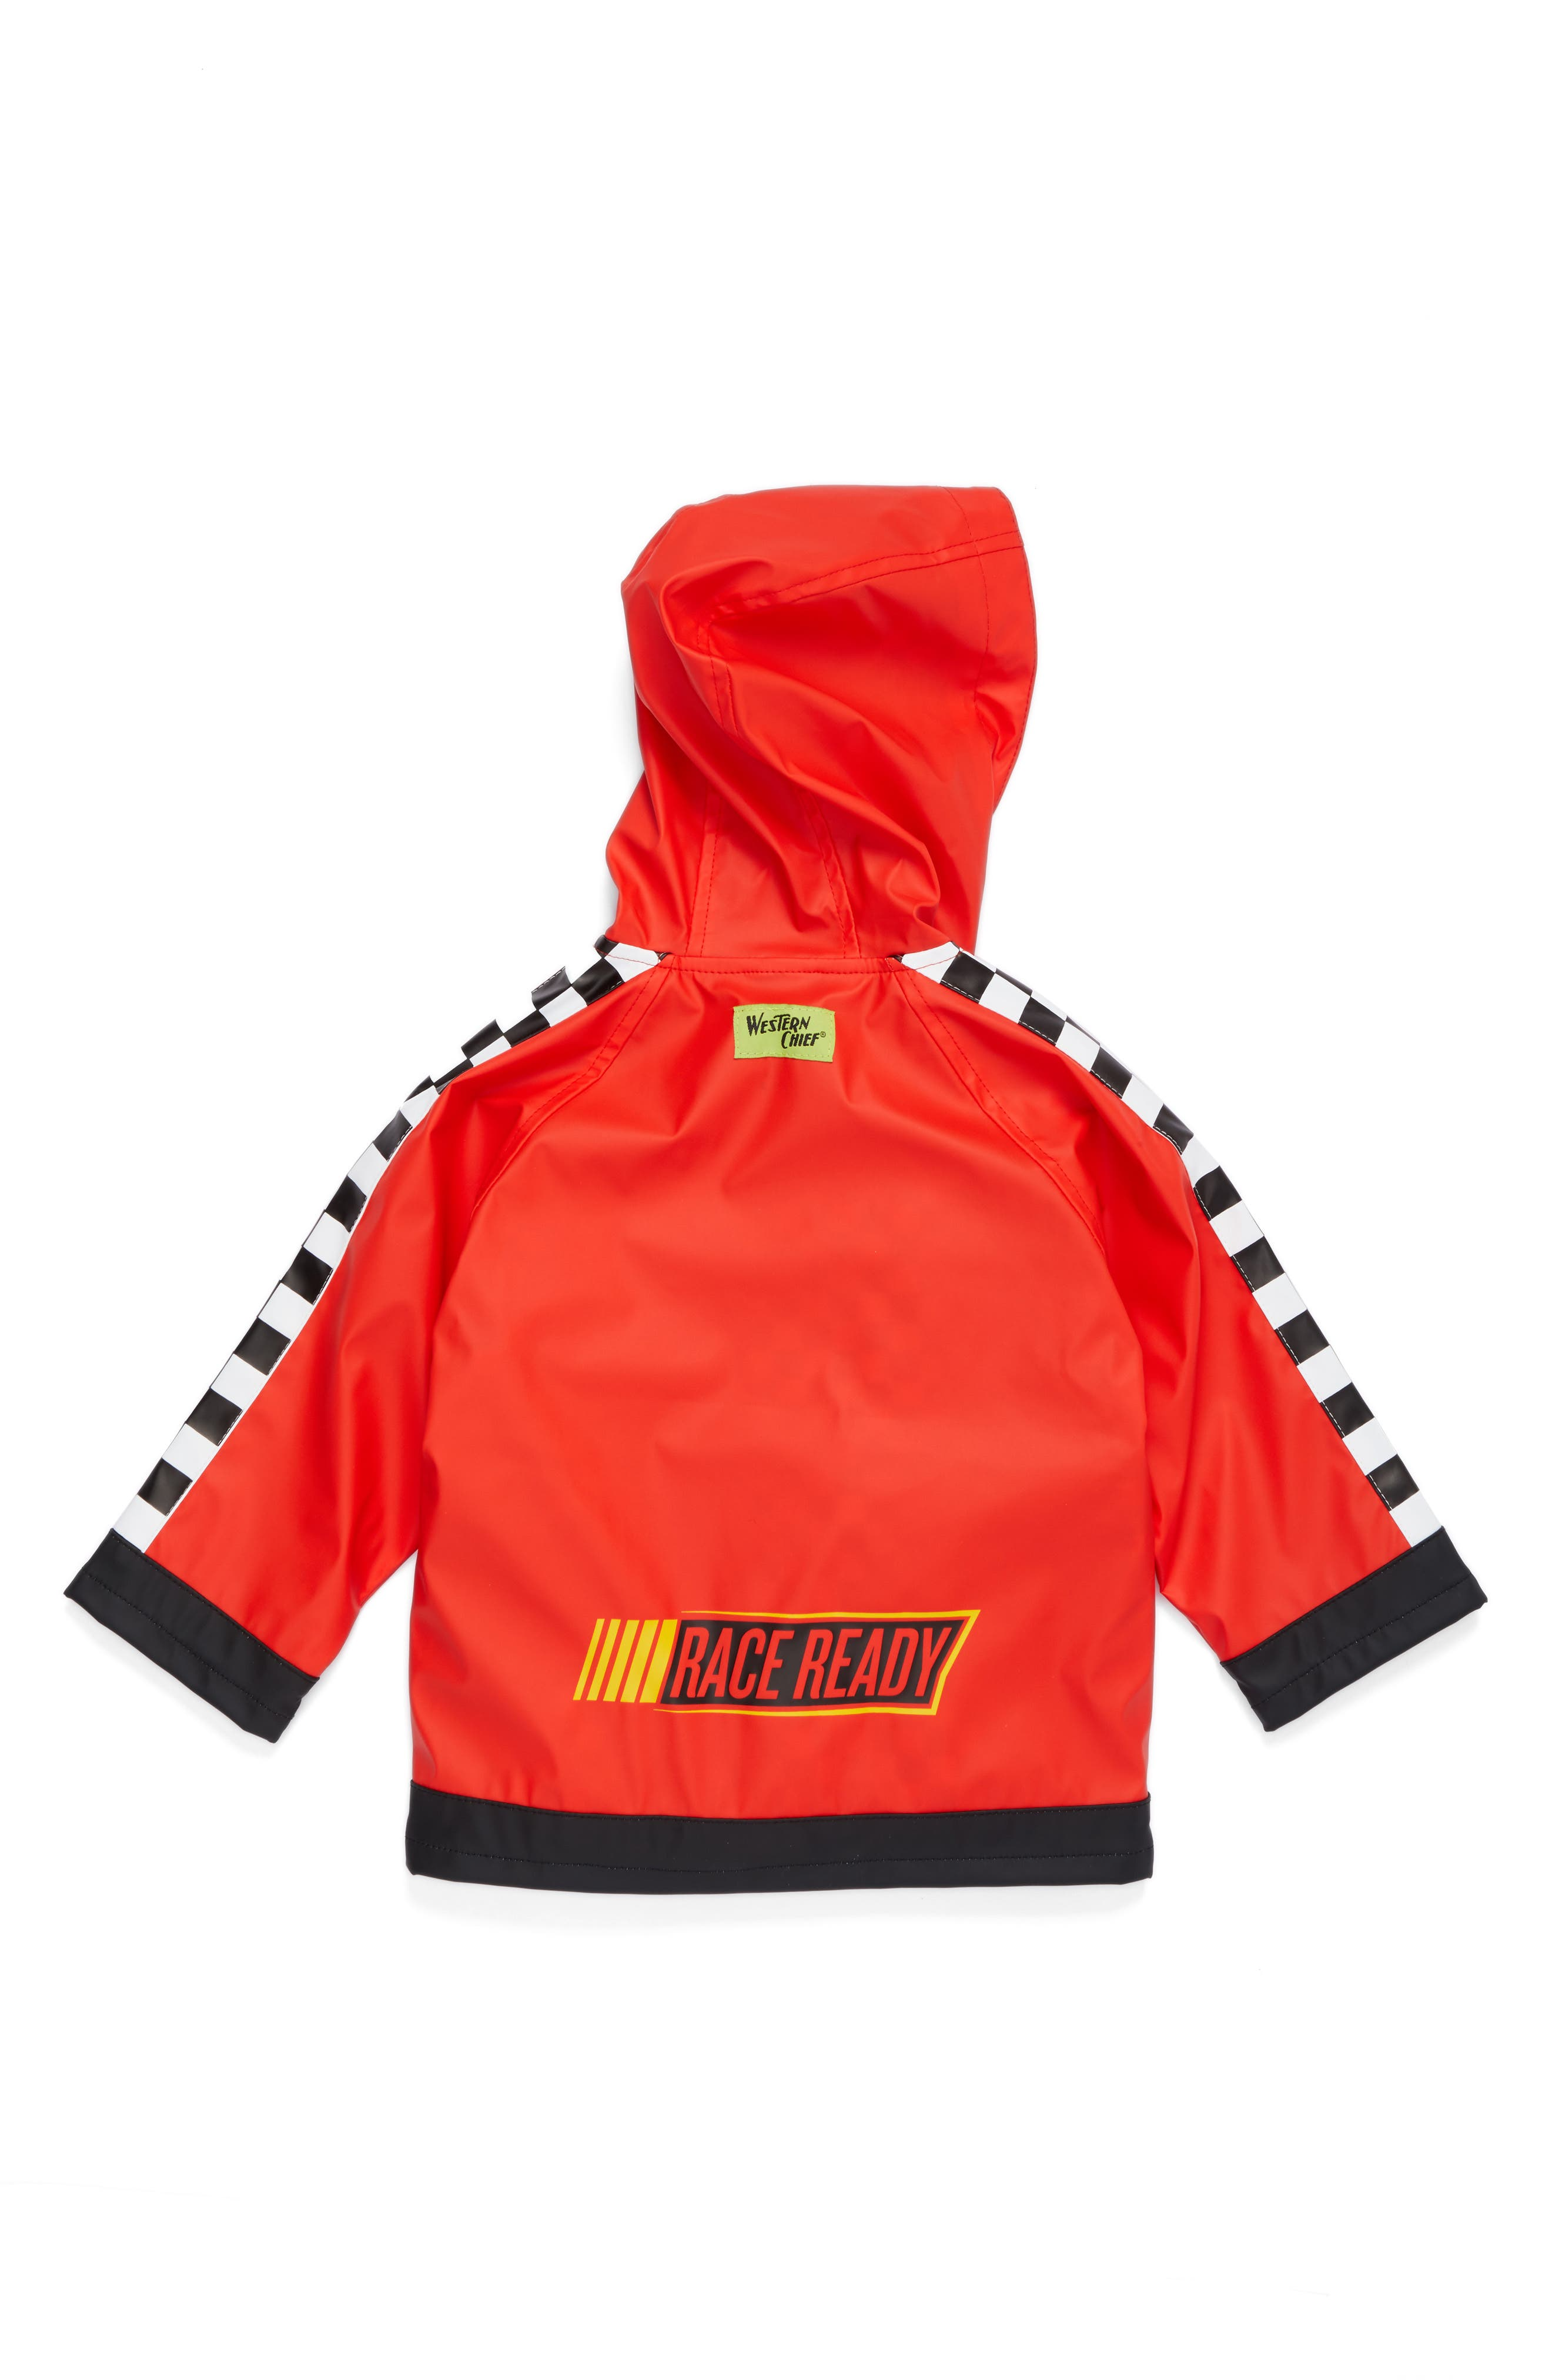 Lightning McQueen Hooded Raincoat,                             Alternate thumbnail 2, color,                             Red